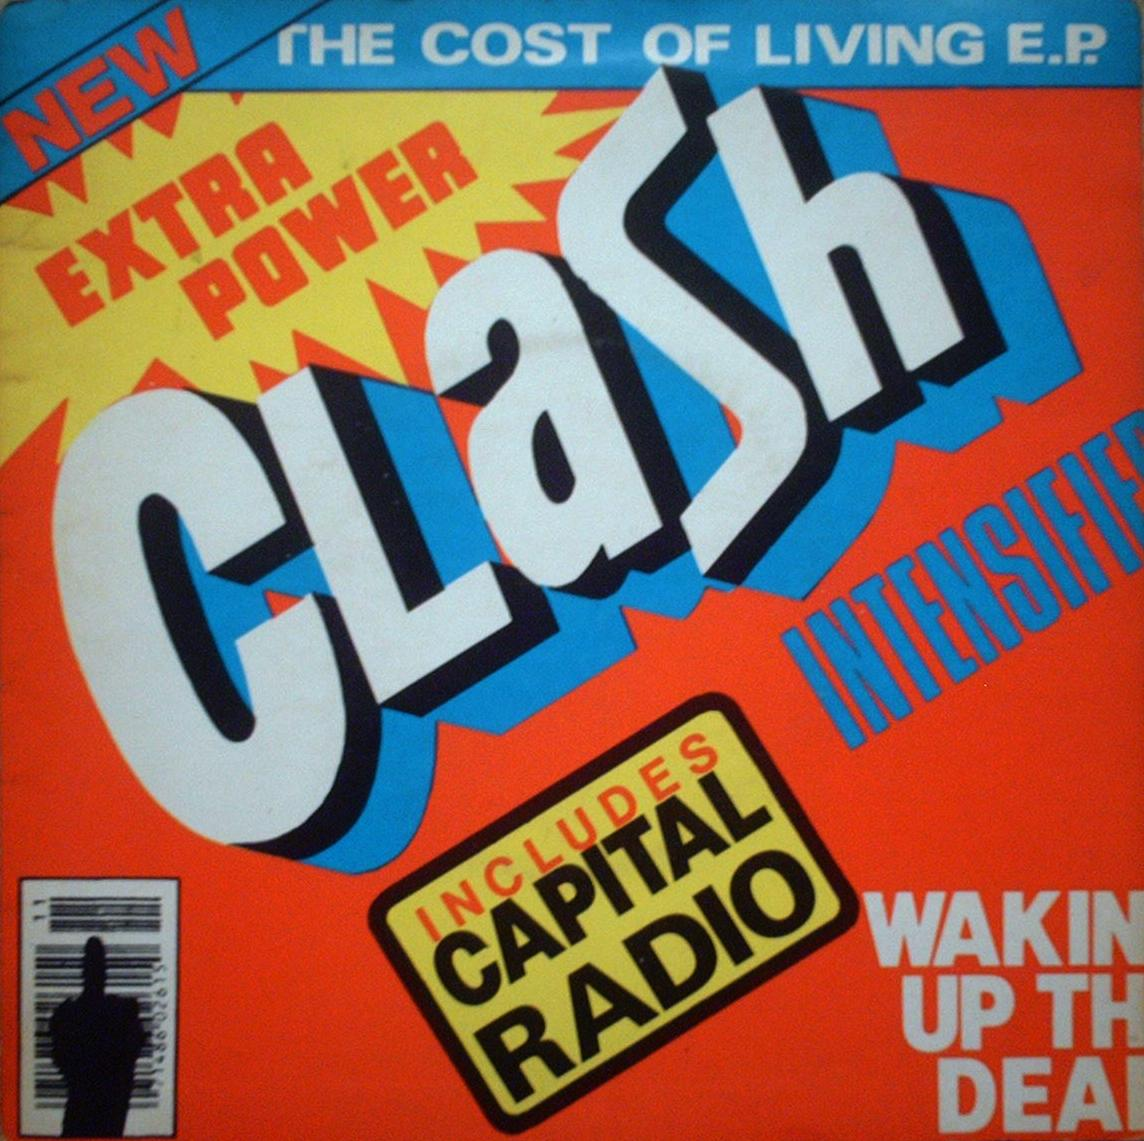 Clash Hitsville UK